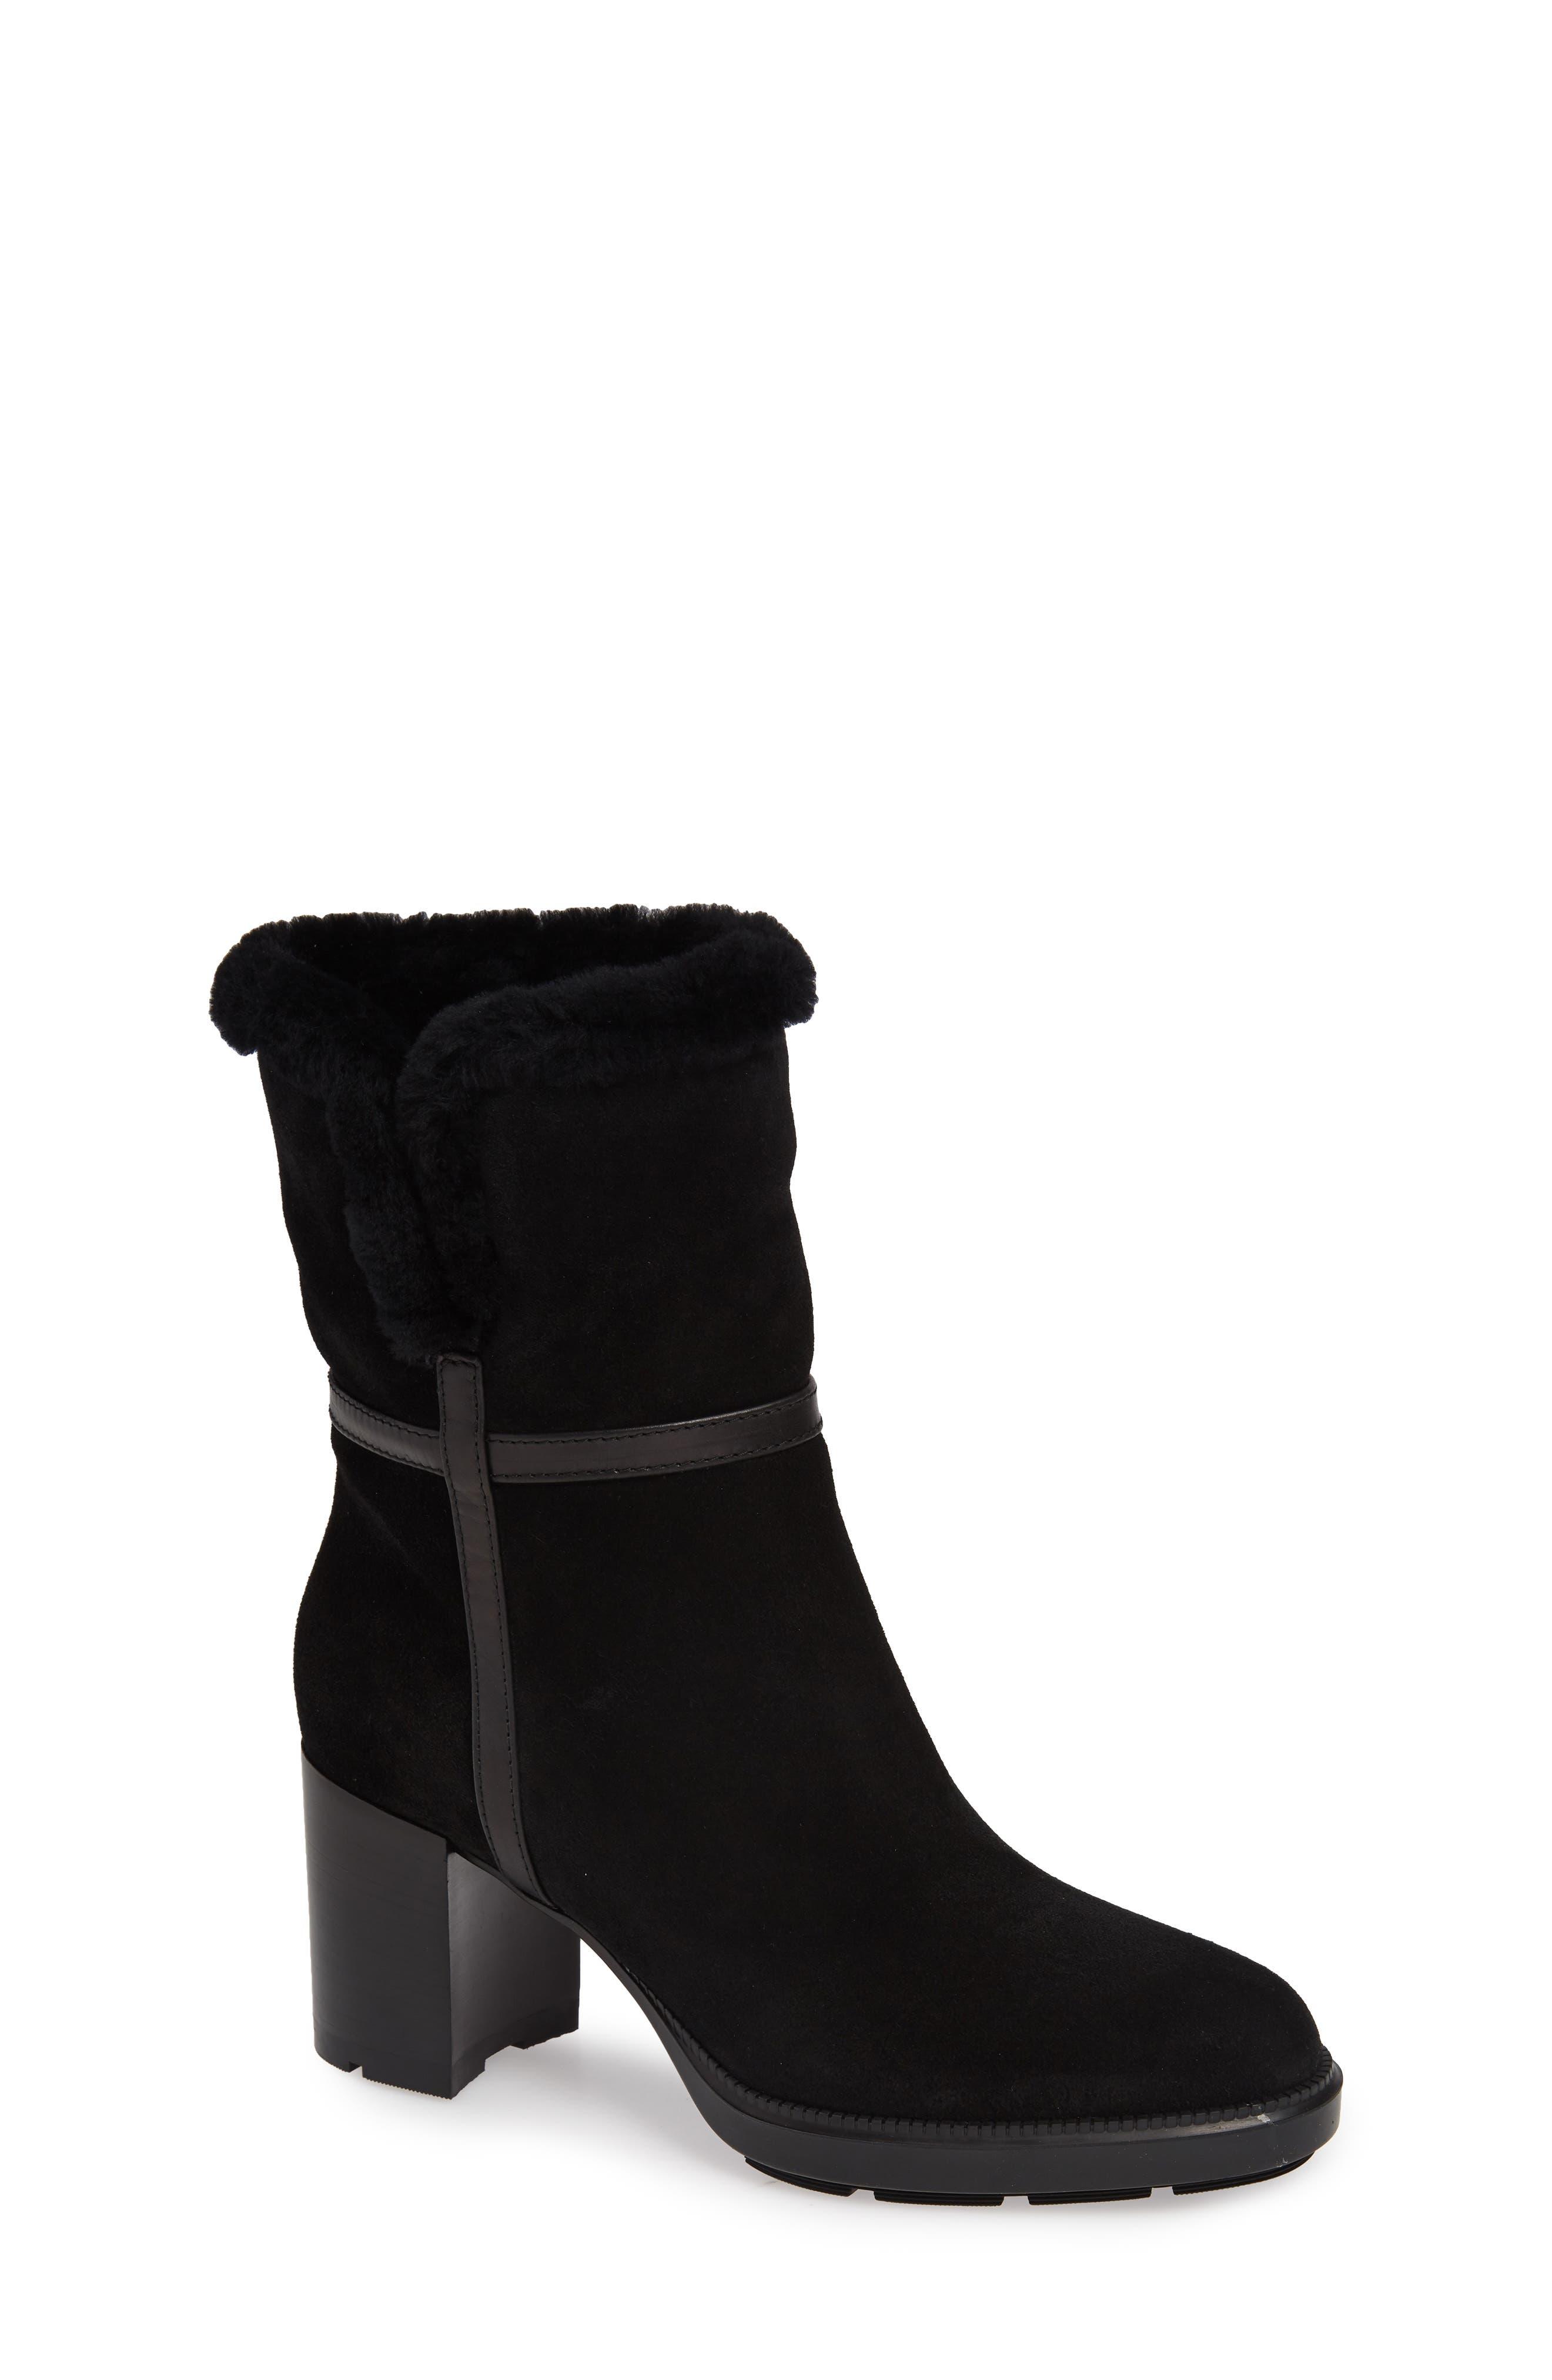 Aquatalia Isolda Genuine Shearling Weatherproof Boot- Black